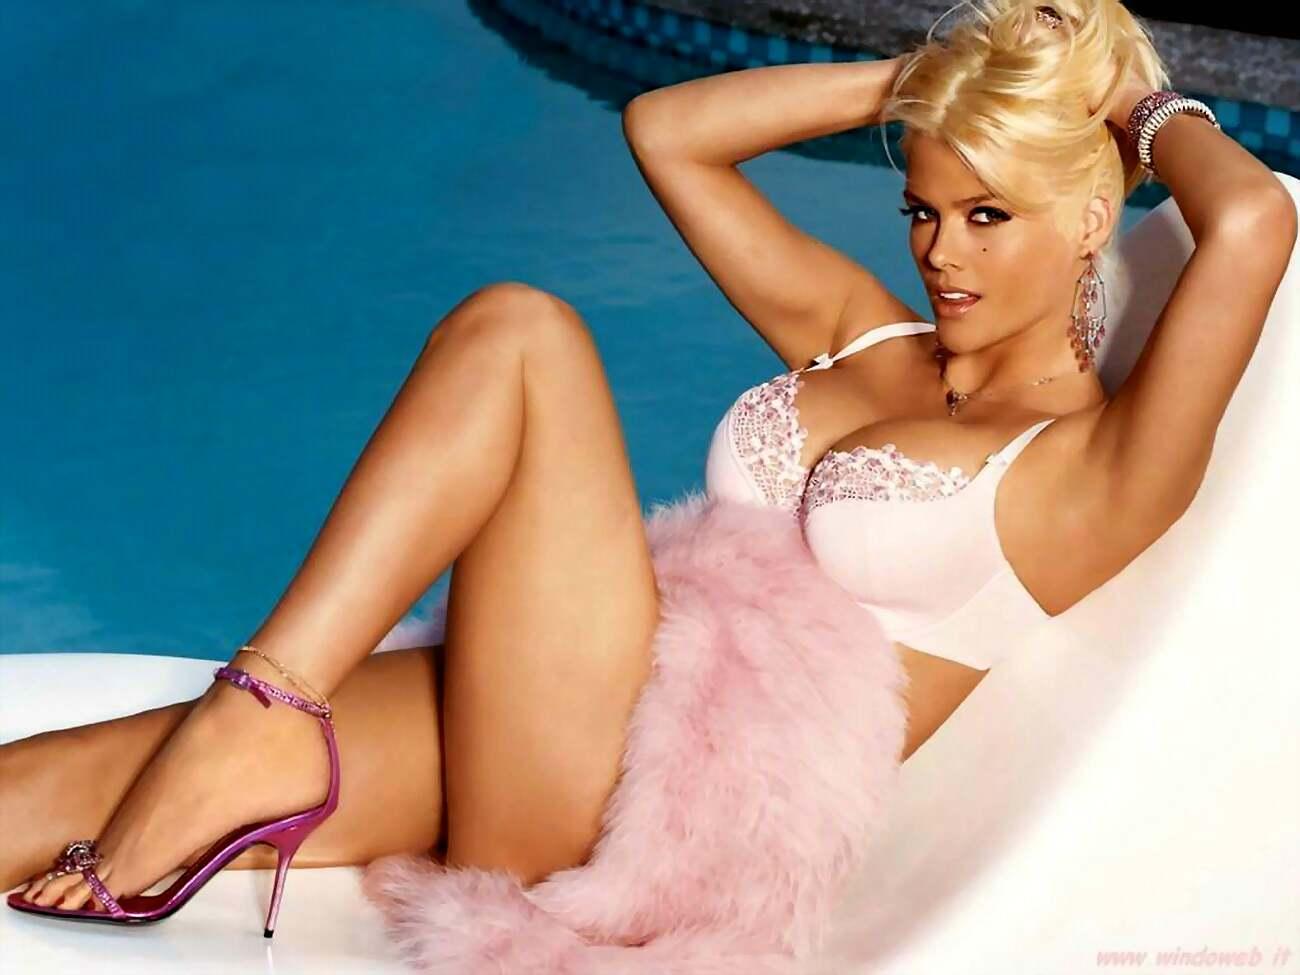 The Fall Film Wallpaper Anna Nicole Smith Fashion Style